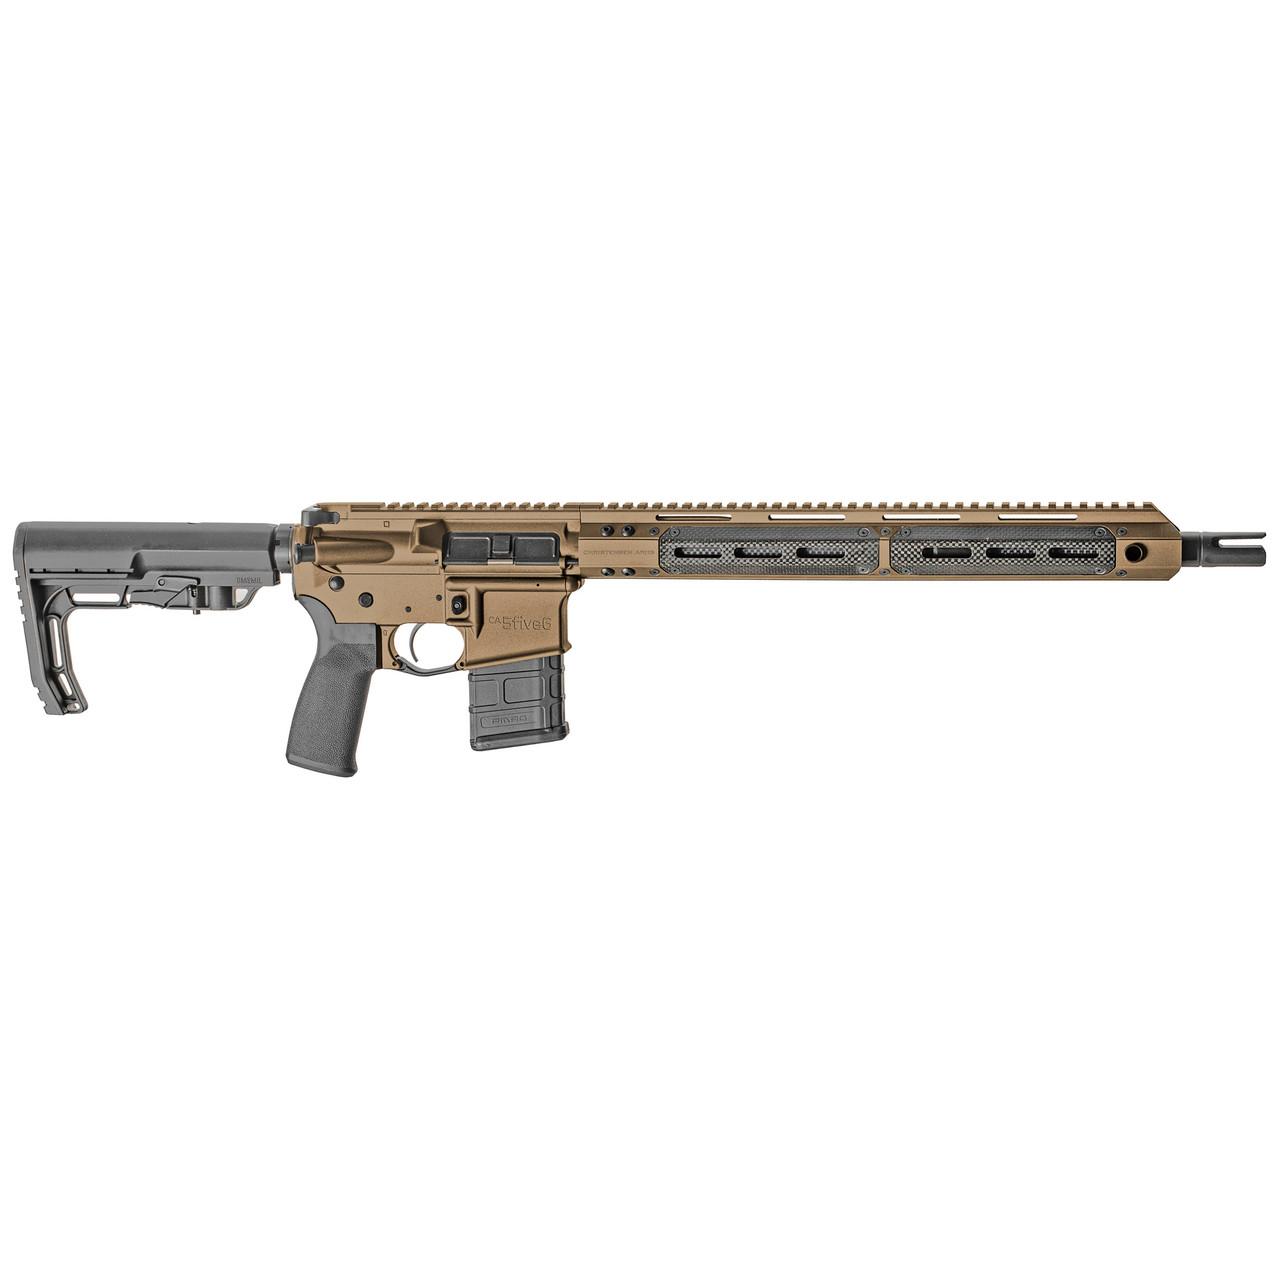 "Christensen Arms CA5five6 16"" CALIFORNIA LEGAL - .223/5.56 - Burnt Bronze w/ Carbon Fiber"